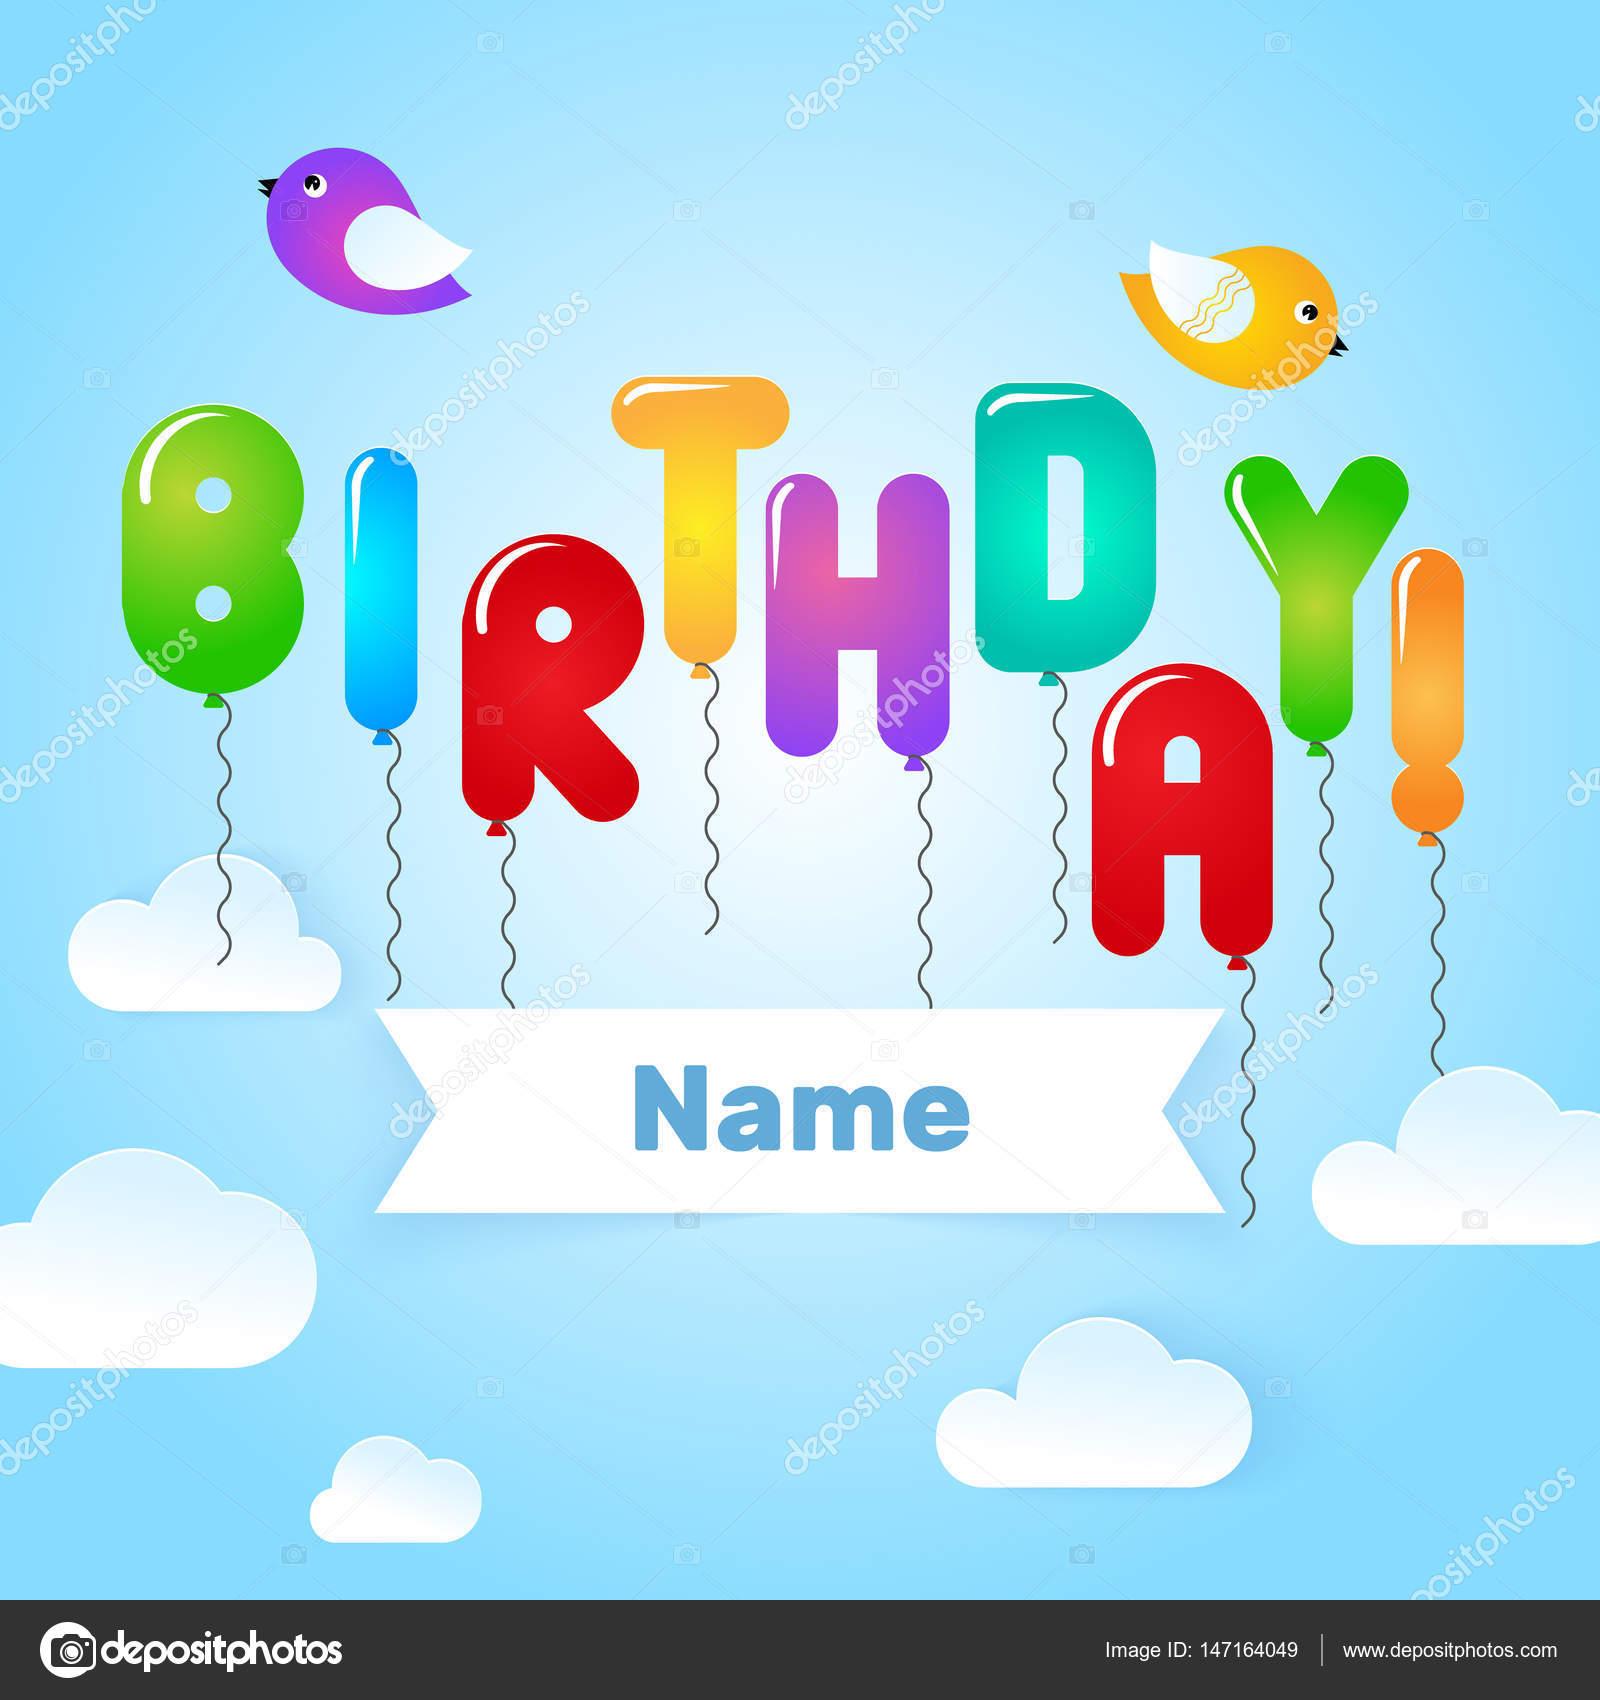 Happy birthday card template stock vector sunolga 147164049 happy birthday card template stock vector bookmarktalkfo Gallery